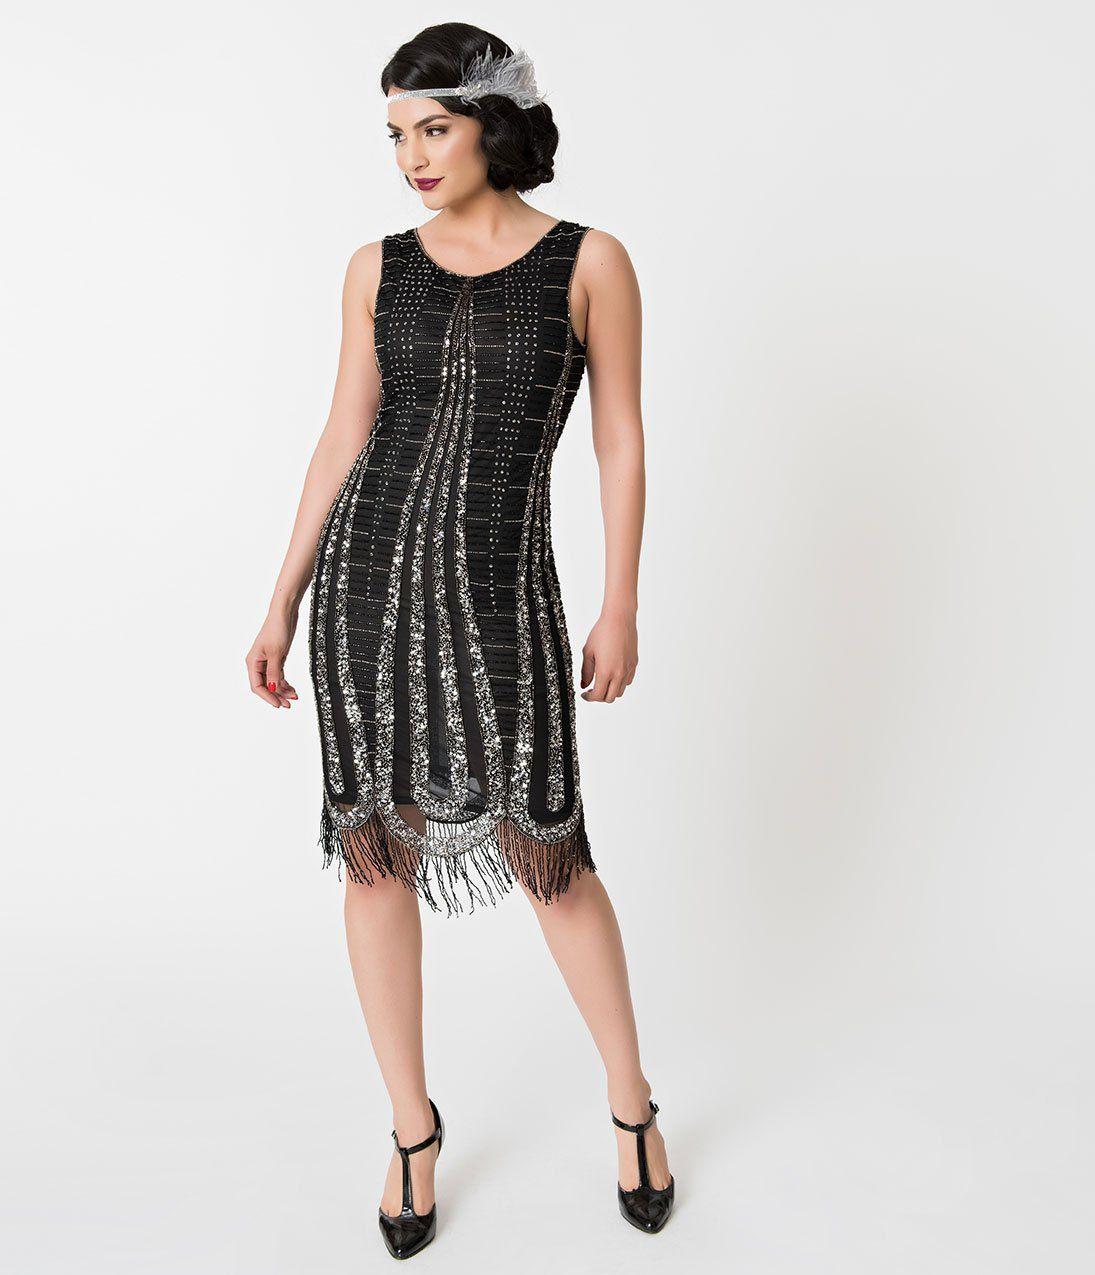 Great Gatsby Dress Great Gatsby Dresses For Sale 1920s Fashion Dresses Great Gatsby Prom Dresses 1920s Evening Dress [ 1275 x 1095 Pixel ]